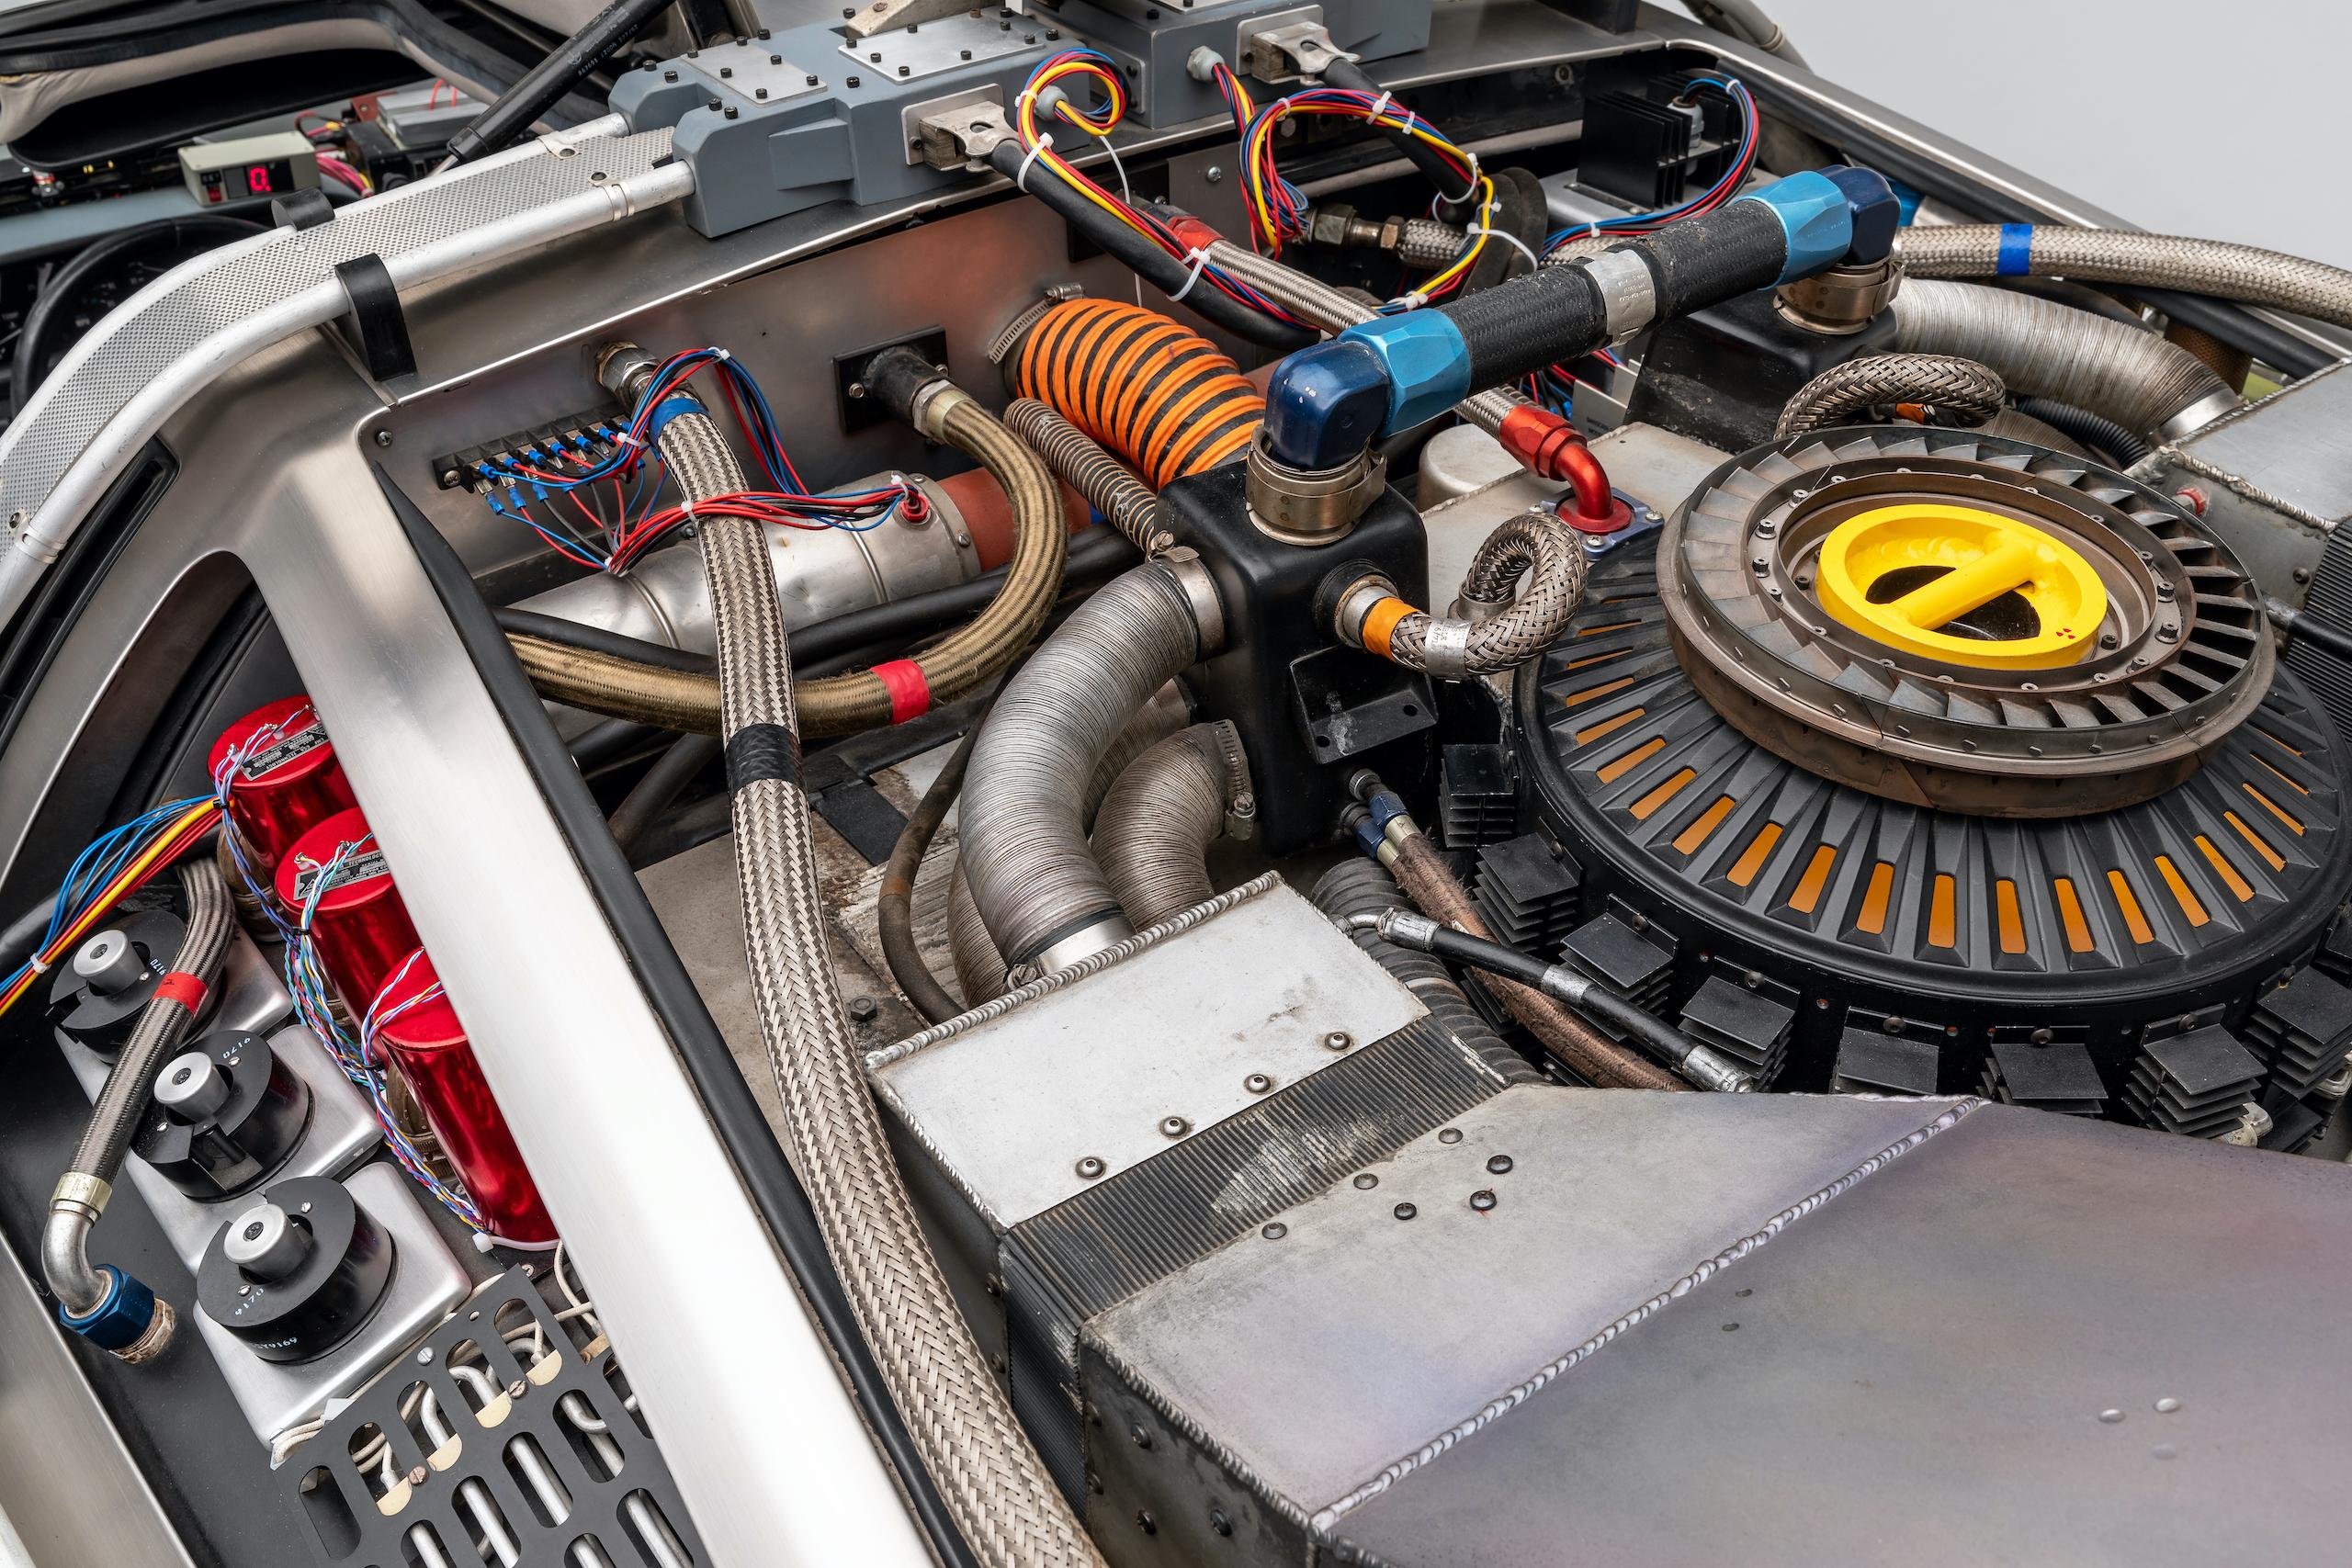 Back to Future DeLorean rear engine detail